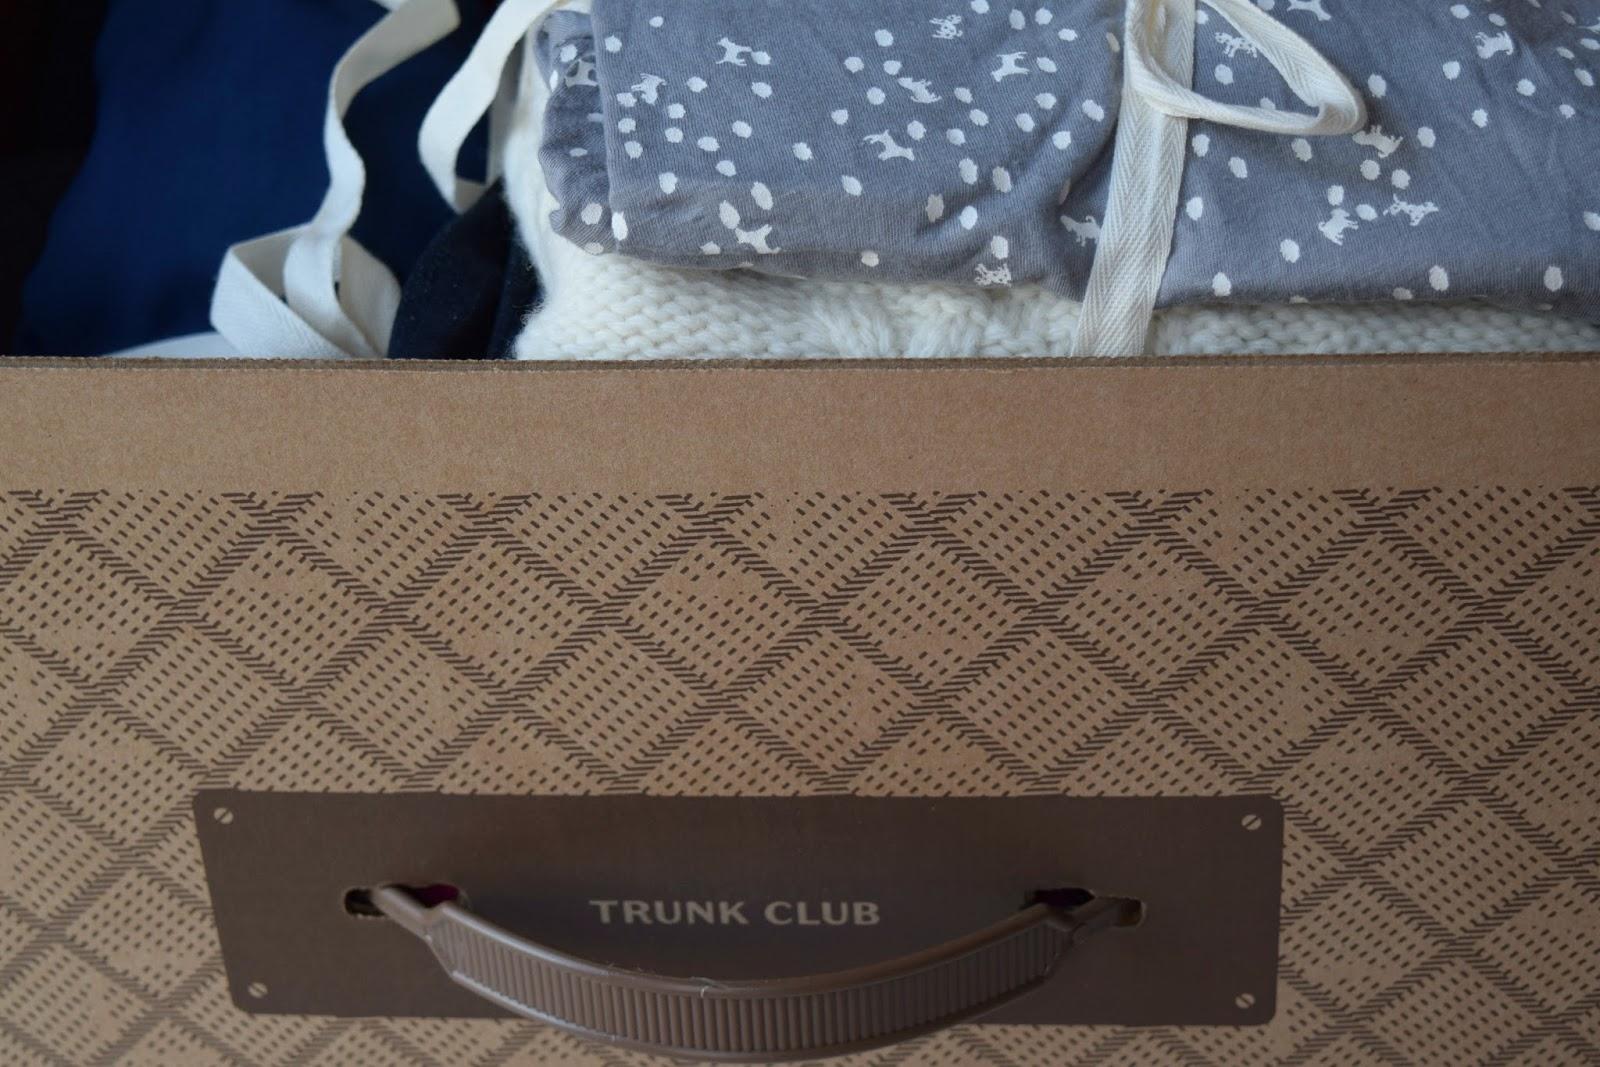 trunk club - trunk club for women - women's trunk club - women's subscription clothing box